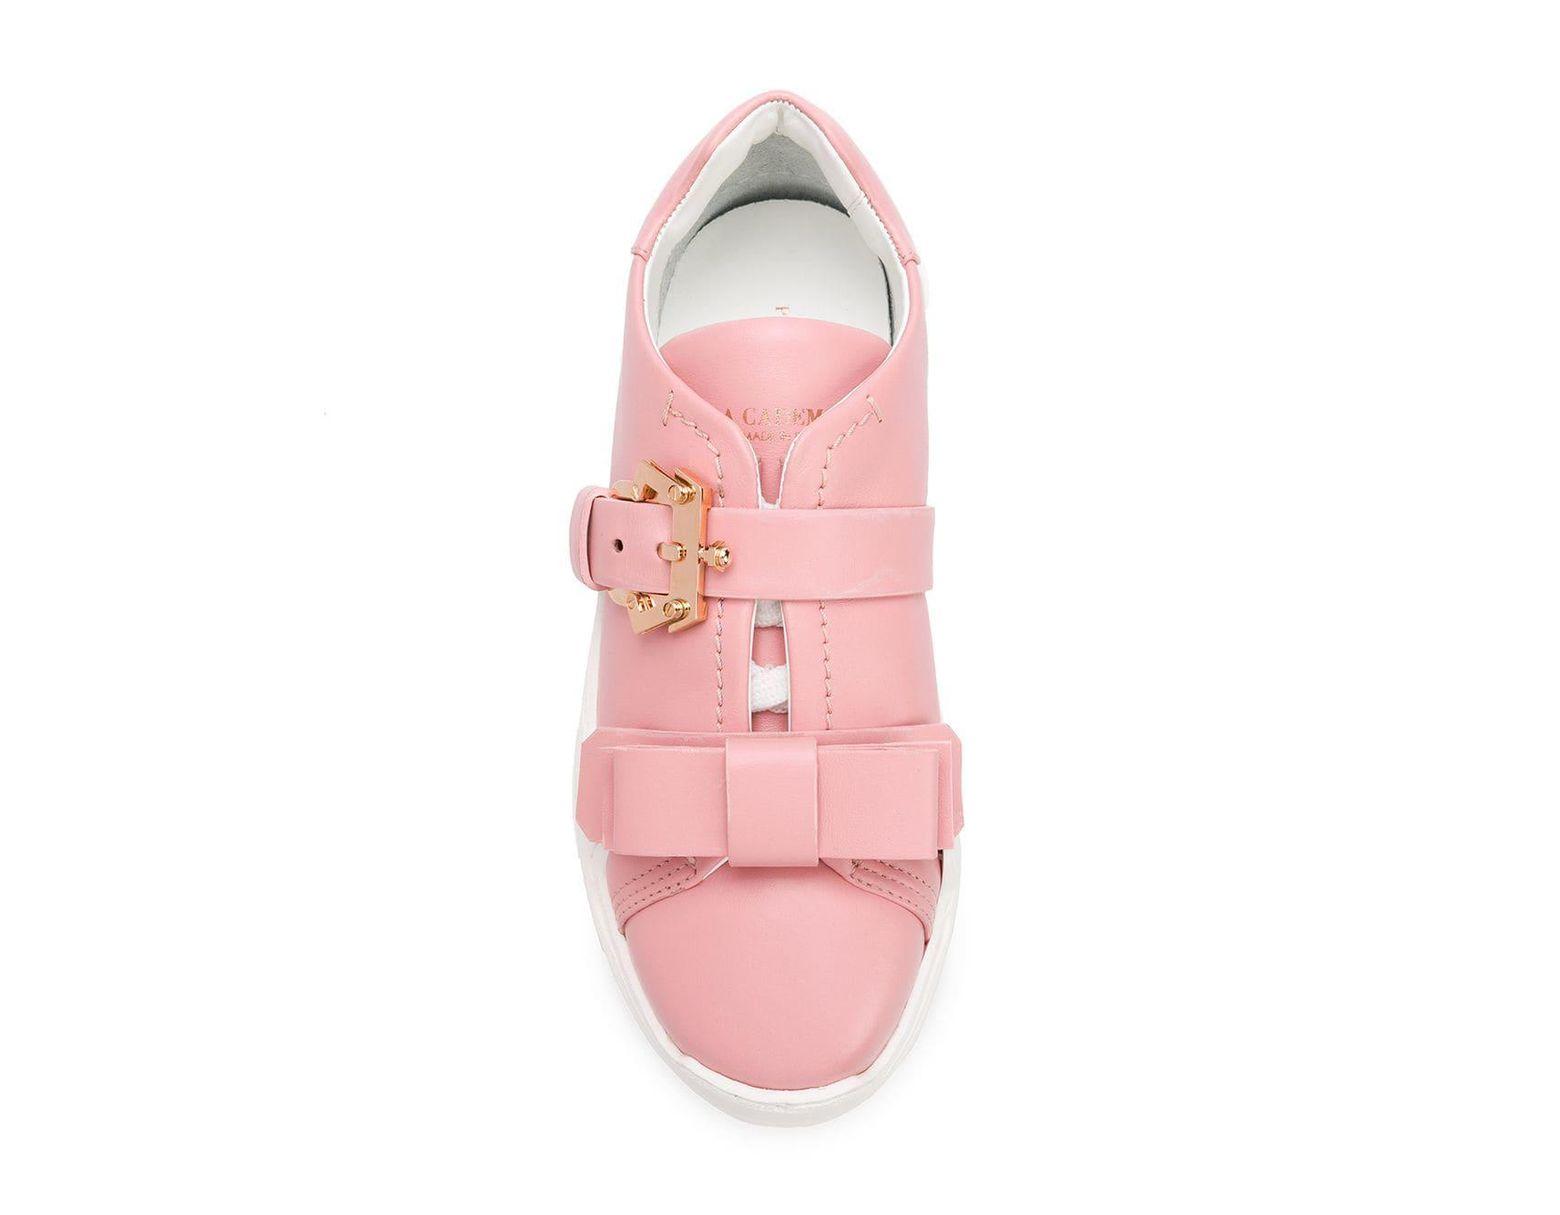 Mit In Damen 'yokoo' Sneakers Pink Schnalle TlFJ1u3Kc